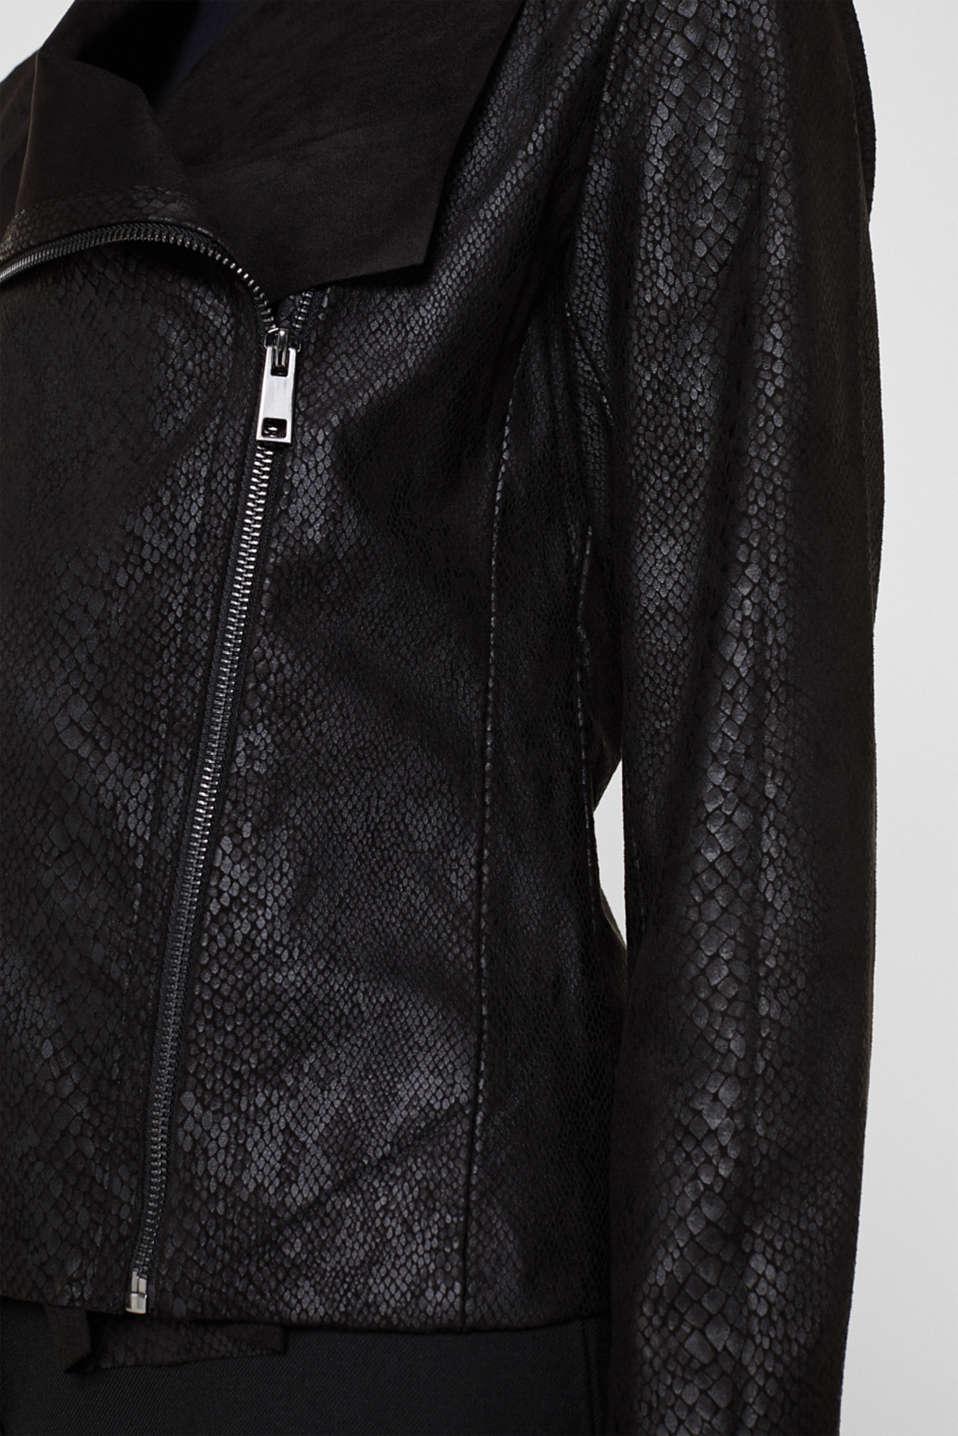 Jackets indoor woven, BLACK, detail image number 2